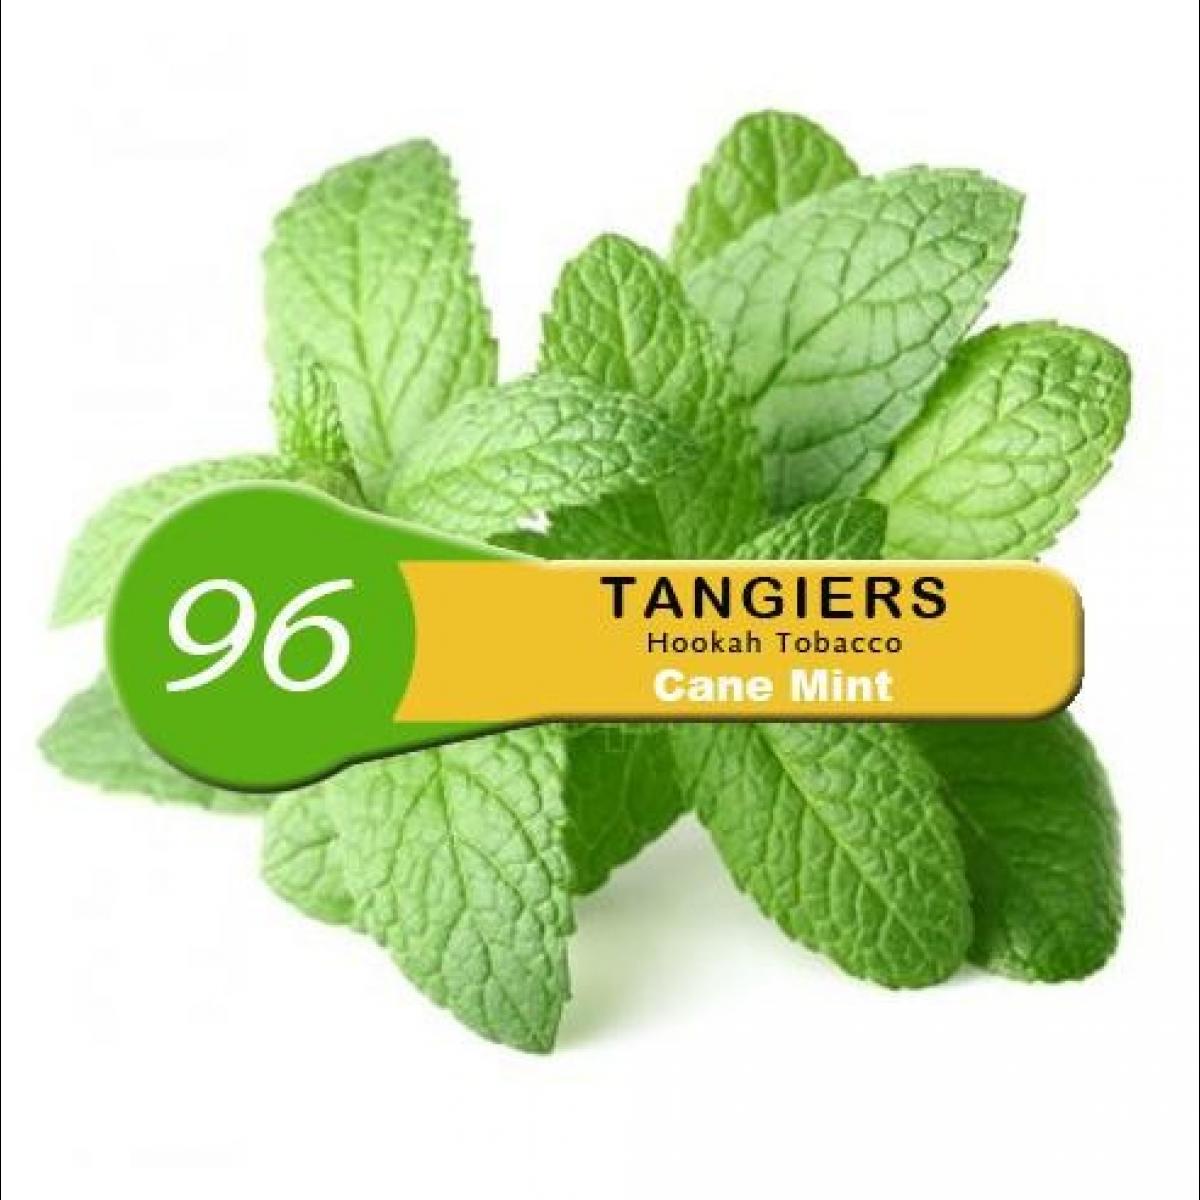 Табак Tangiers Noir Cane Mint 96 (Танжирс Тростниковая мята) 250 г.